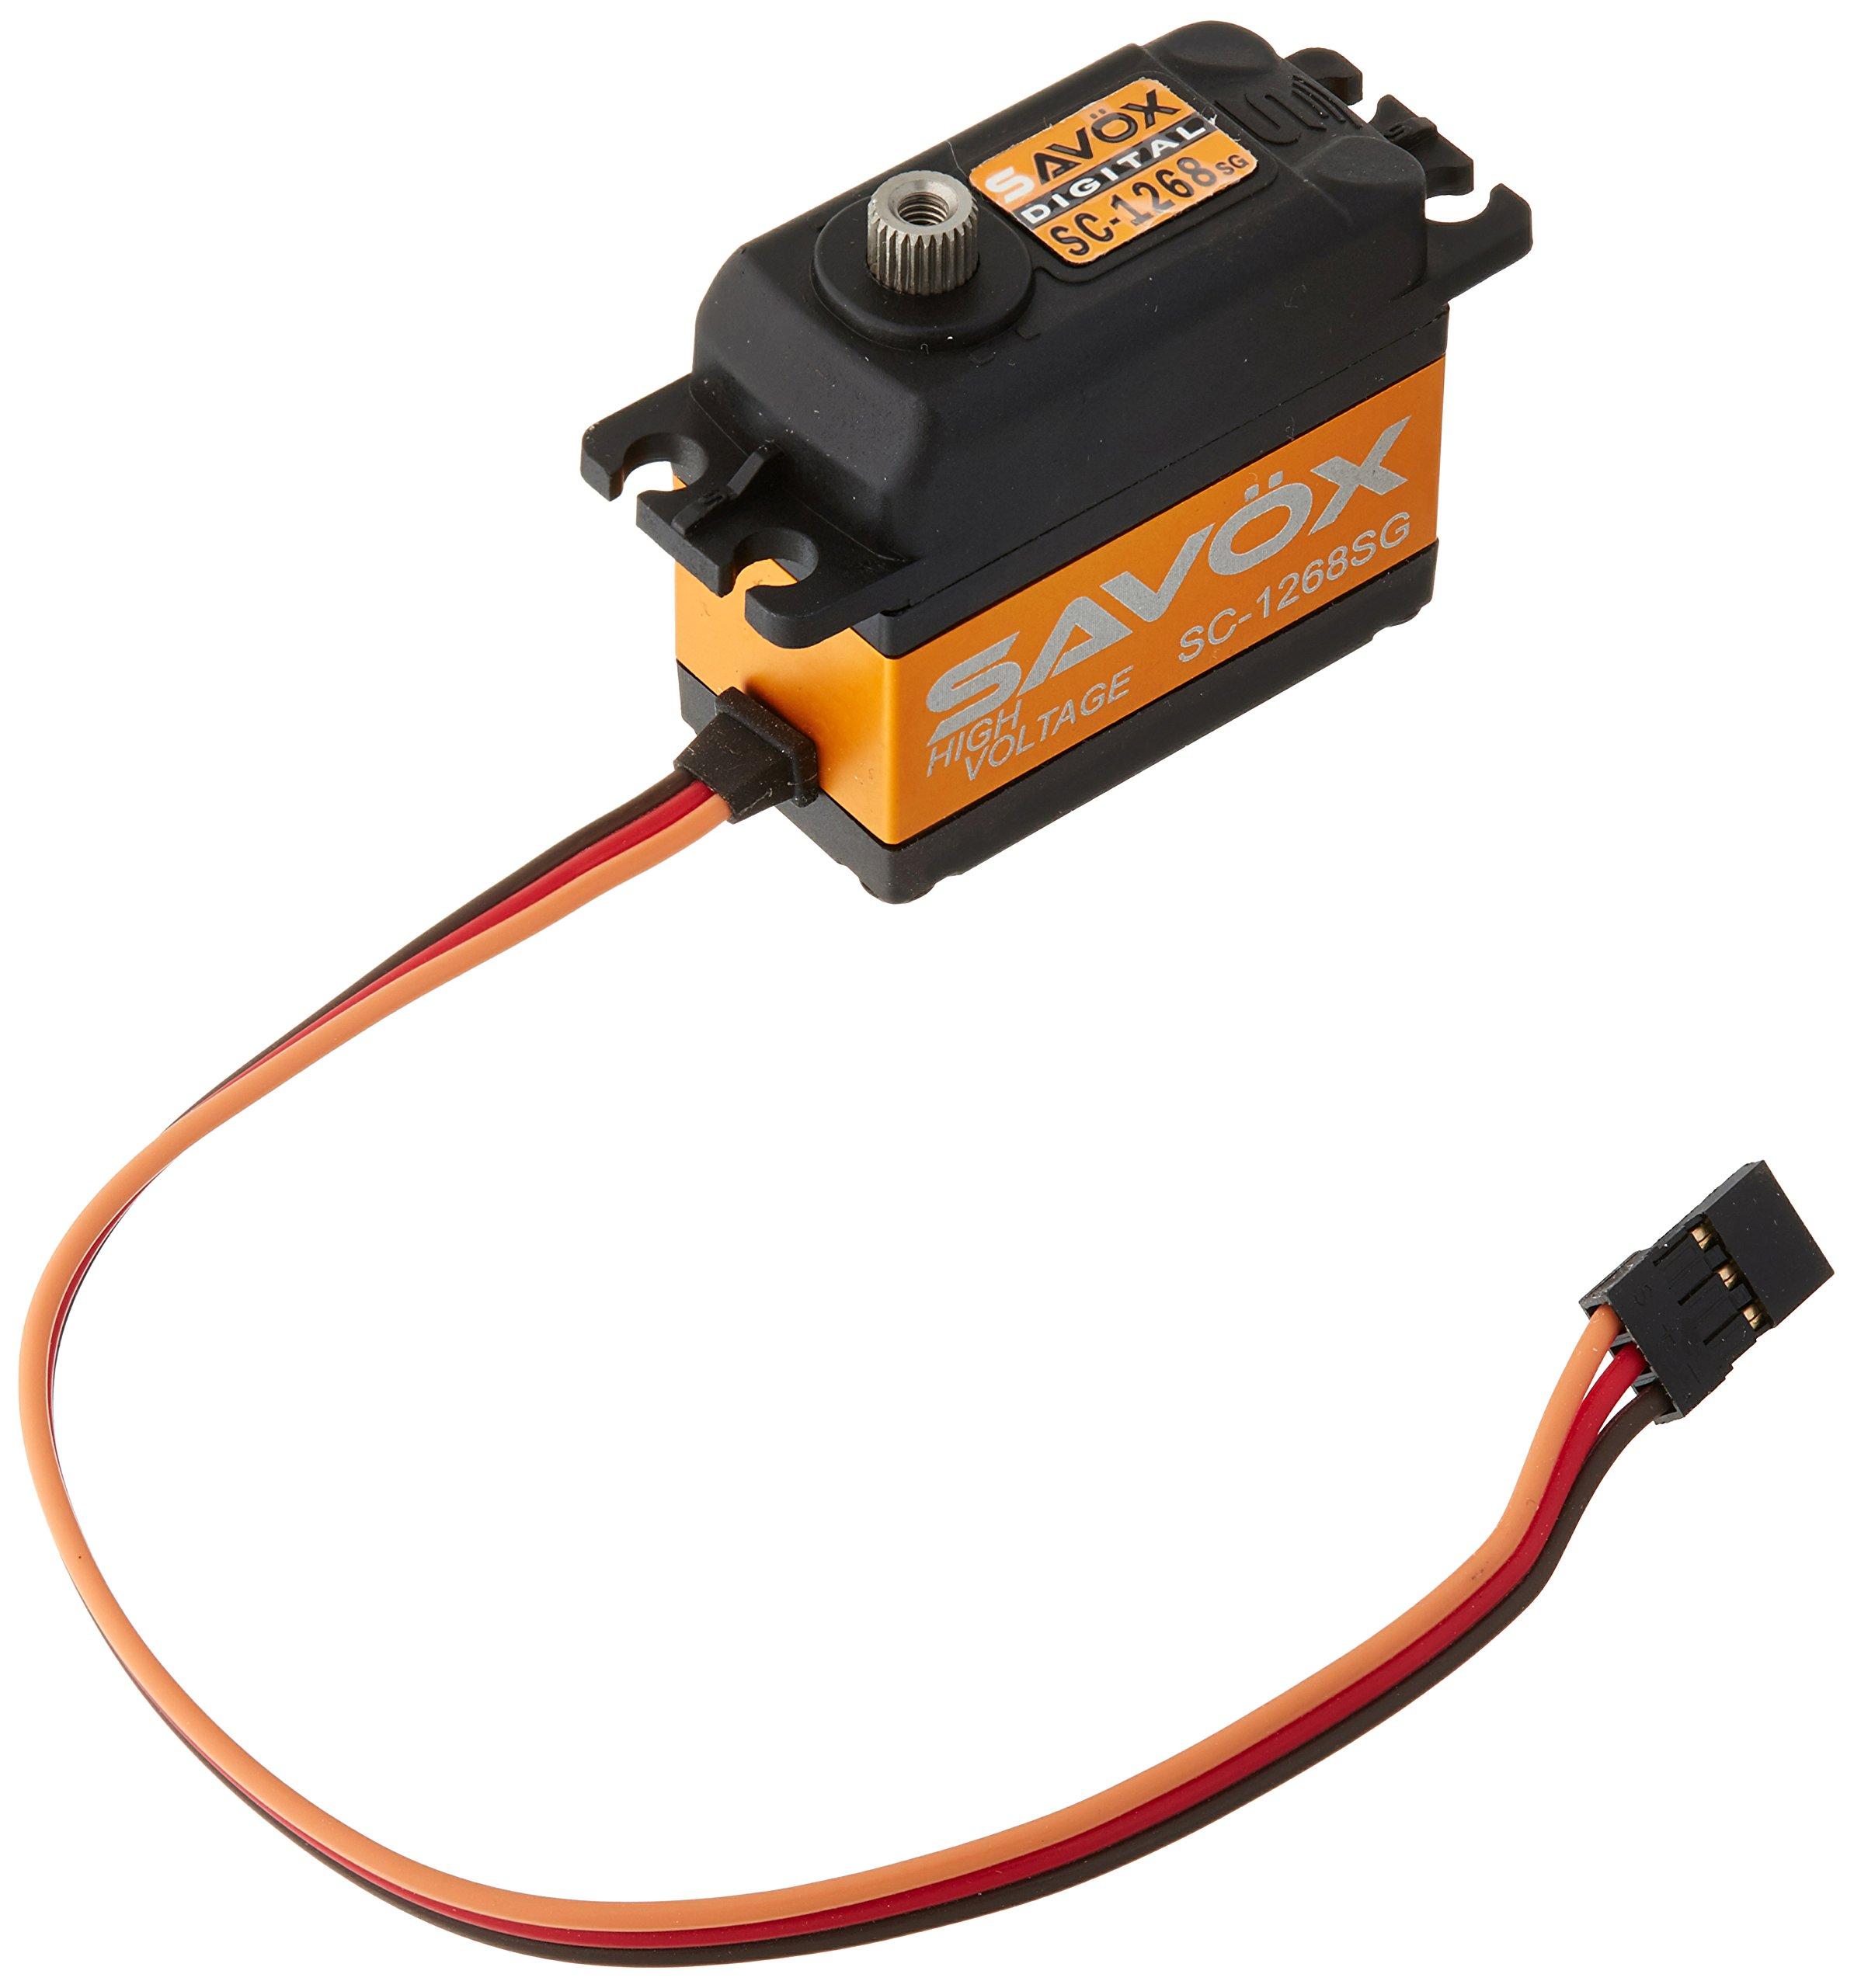 Savox SC-1268SG High Torque Steel Gear Standard Digital Servo High Voltage